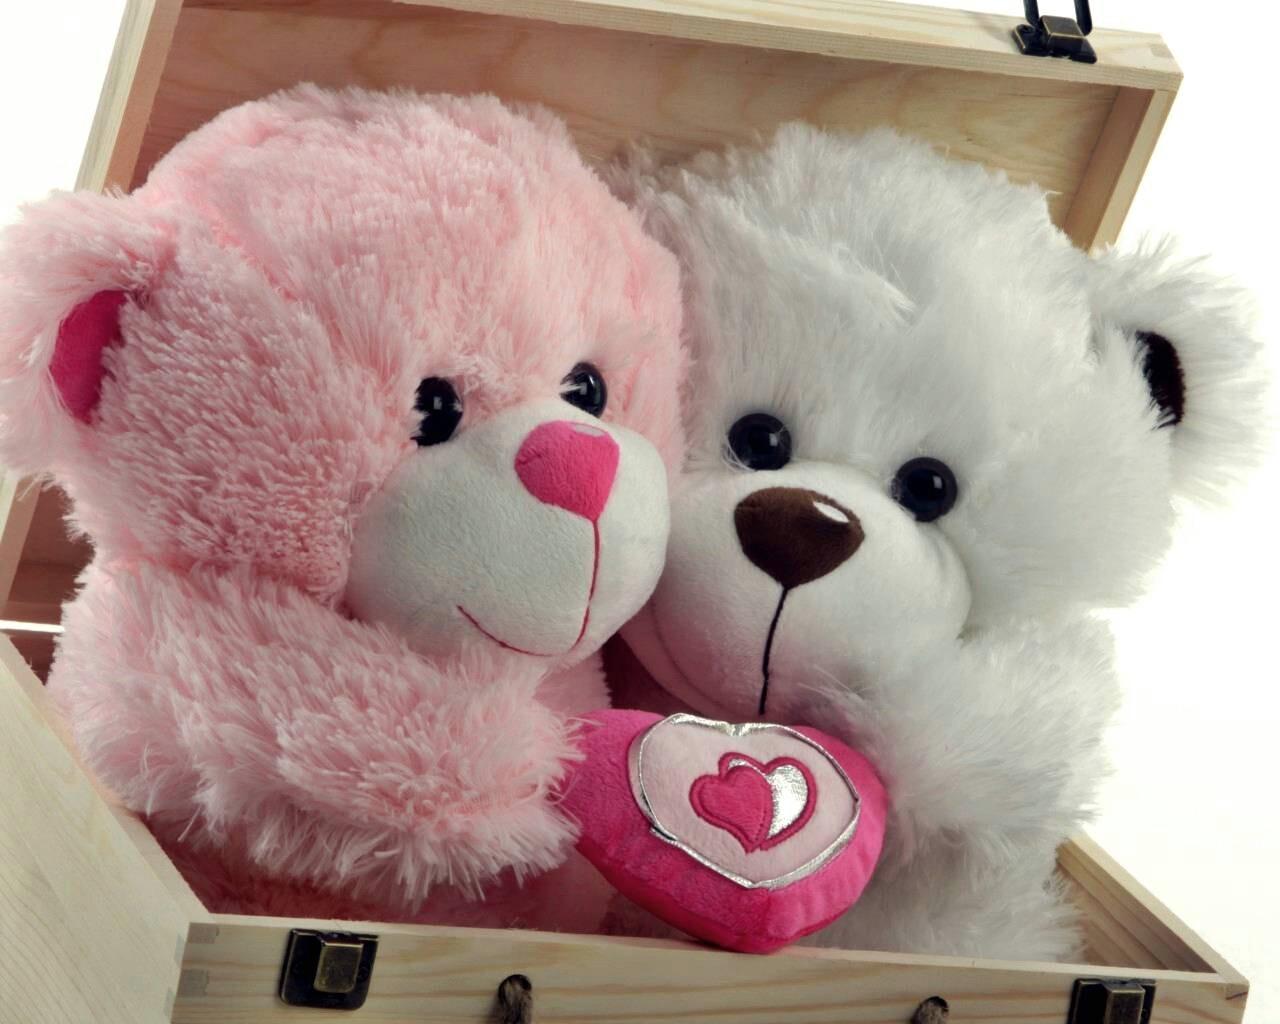 Free Download Pics Photos Download Cute Teddy Bear Wallpaper